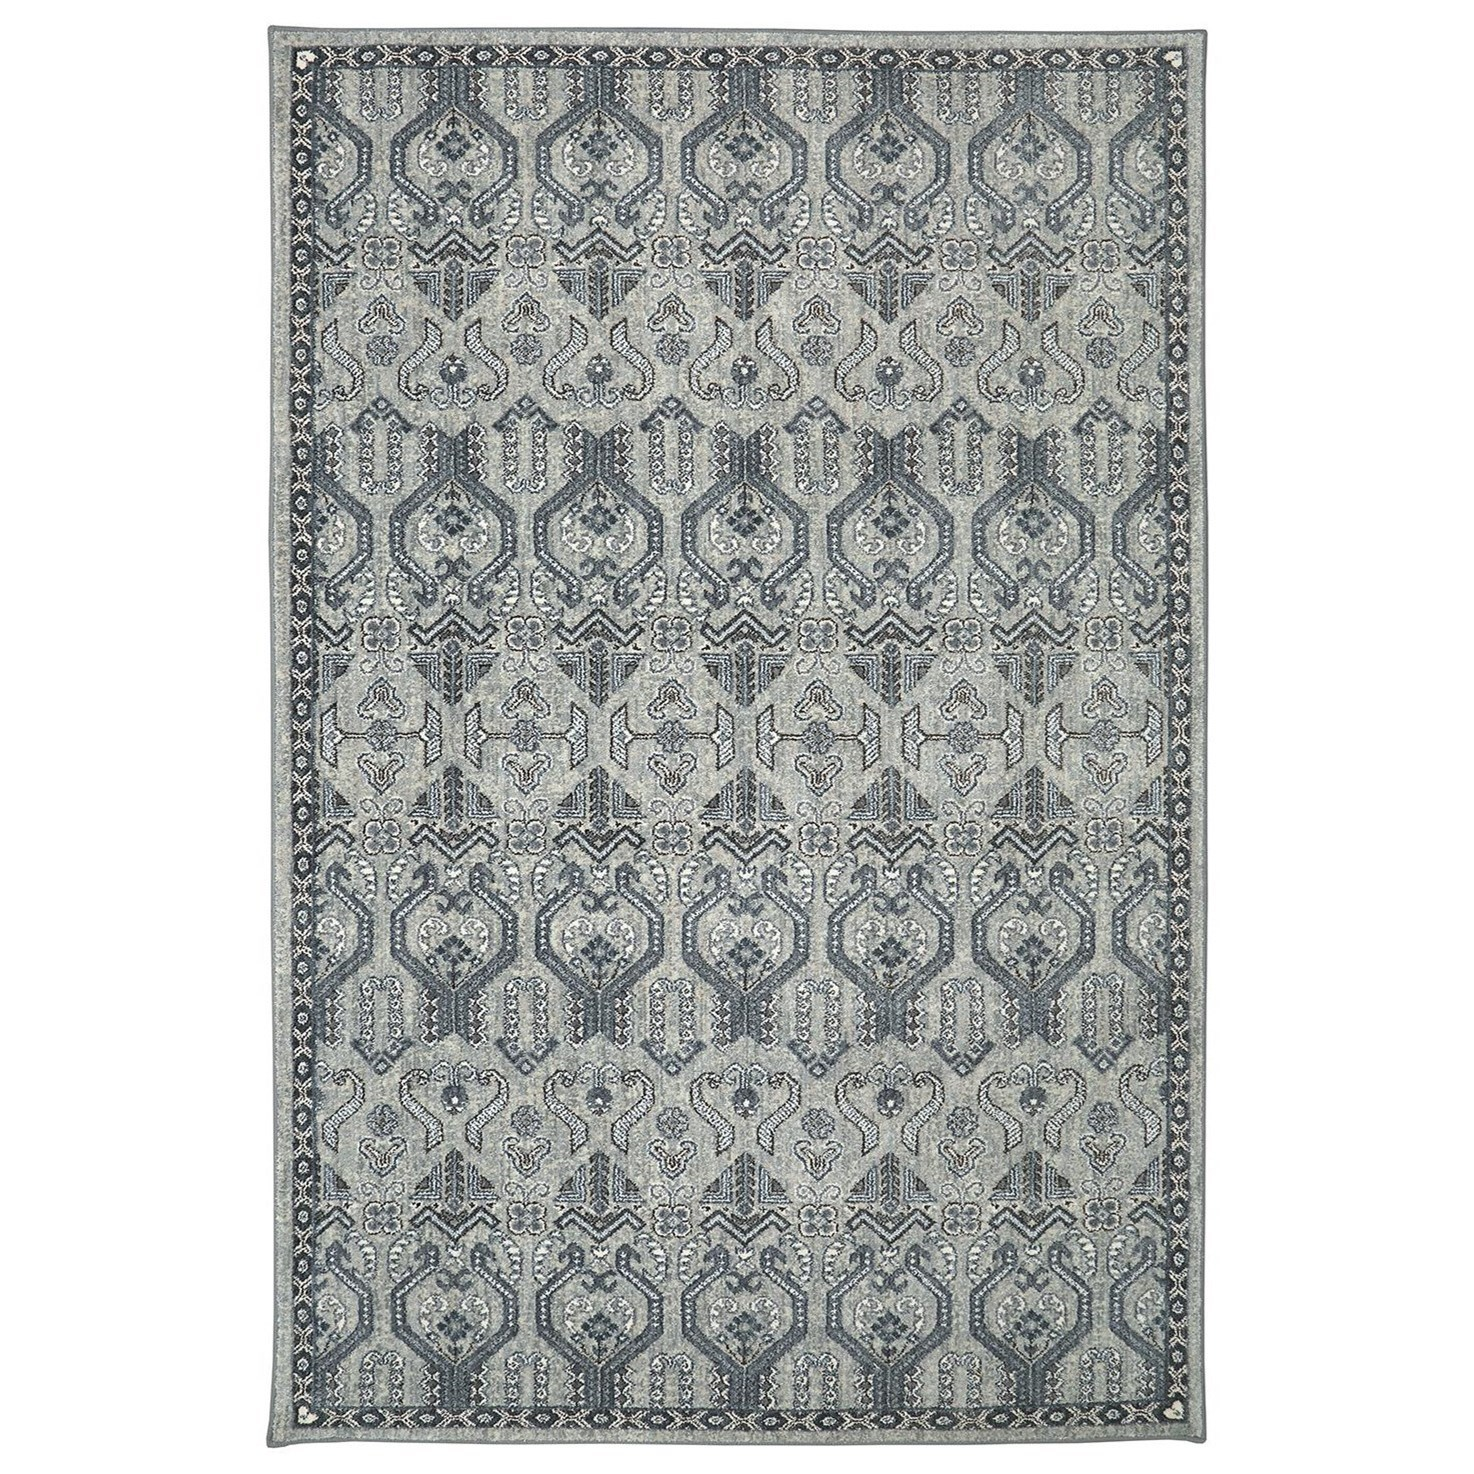 Karastan Rugs Euphoria 3'6x5'6 Castine Willow Grey Rug - Item Number: 90646 90075 042066